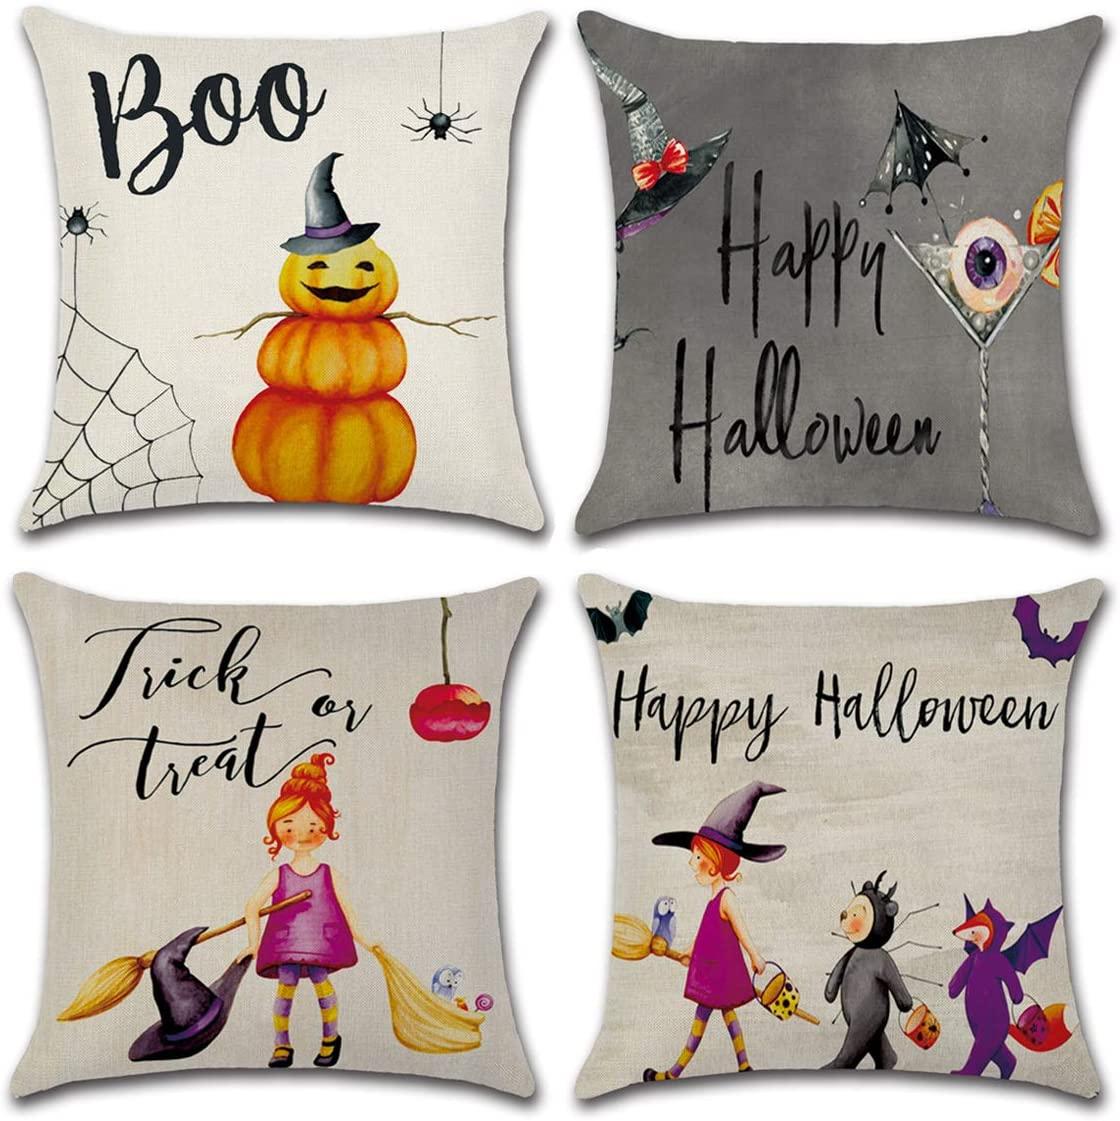 Danirora Halloween Pillow Covers 18x18, [4 Pack] Halloween Decoration Pillows Decorative Linen Throw Pillows Decor Square Burlap with Bat Pumpkin Little Witch Set of 4